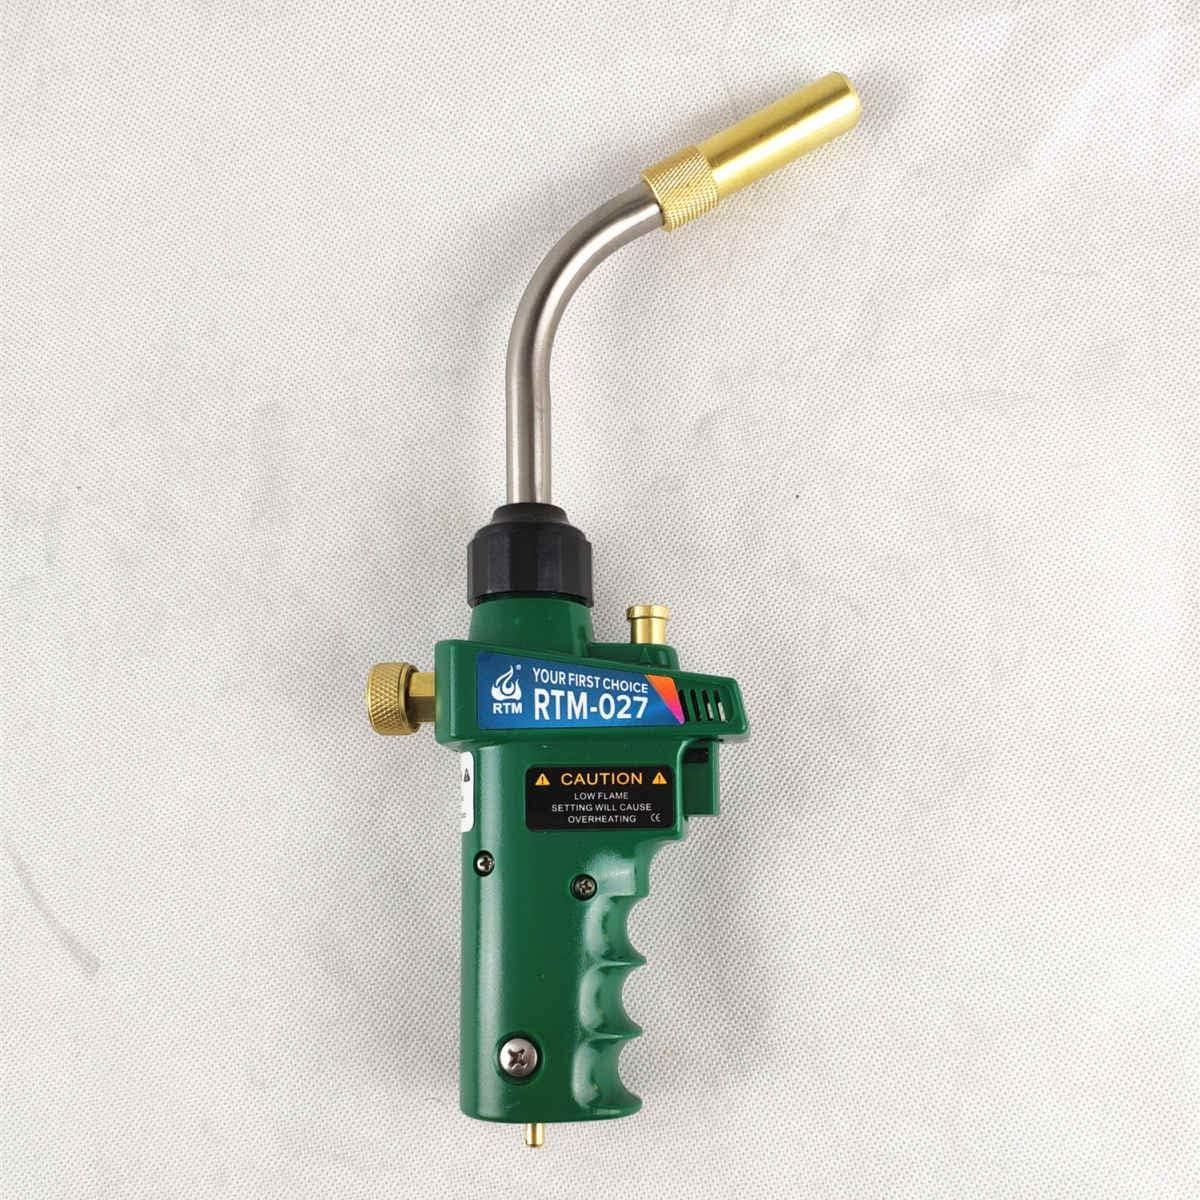 Mapp Gas Self Ignition Trigger Turbo Torch Brazing Propane Plumbing HVAC